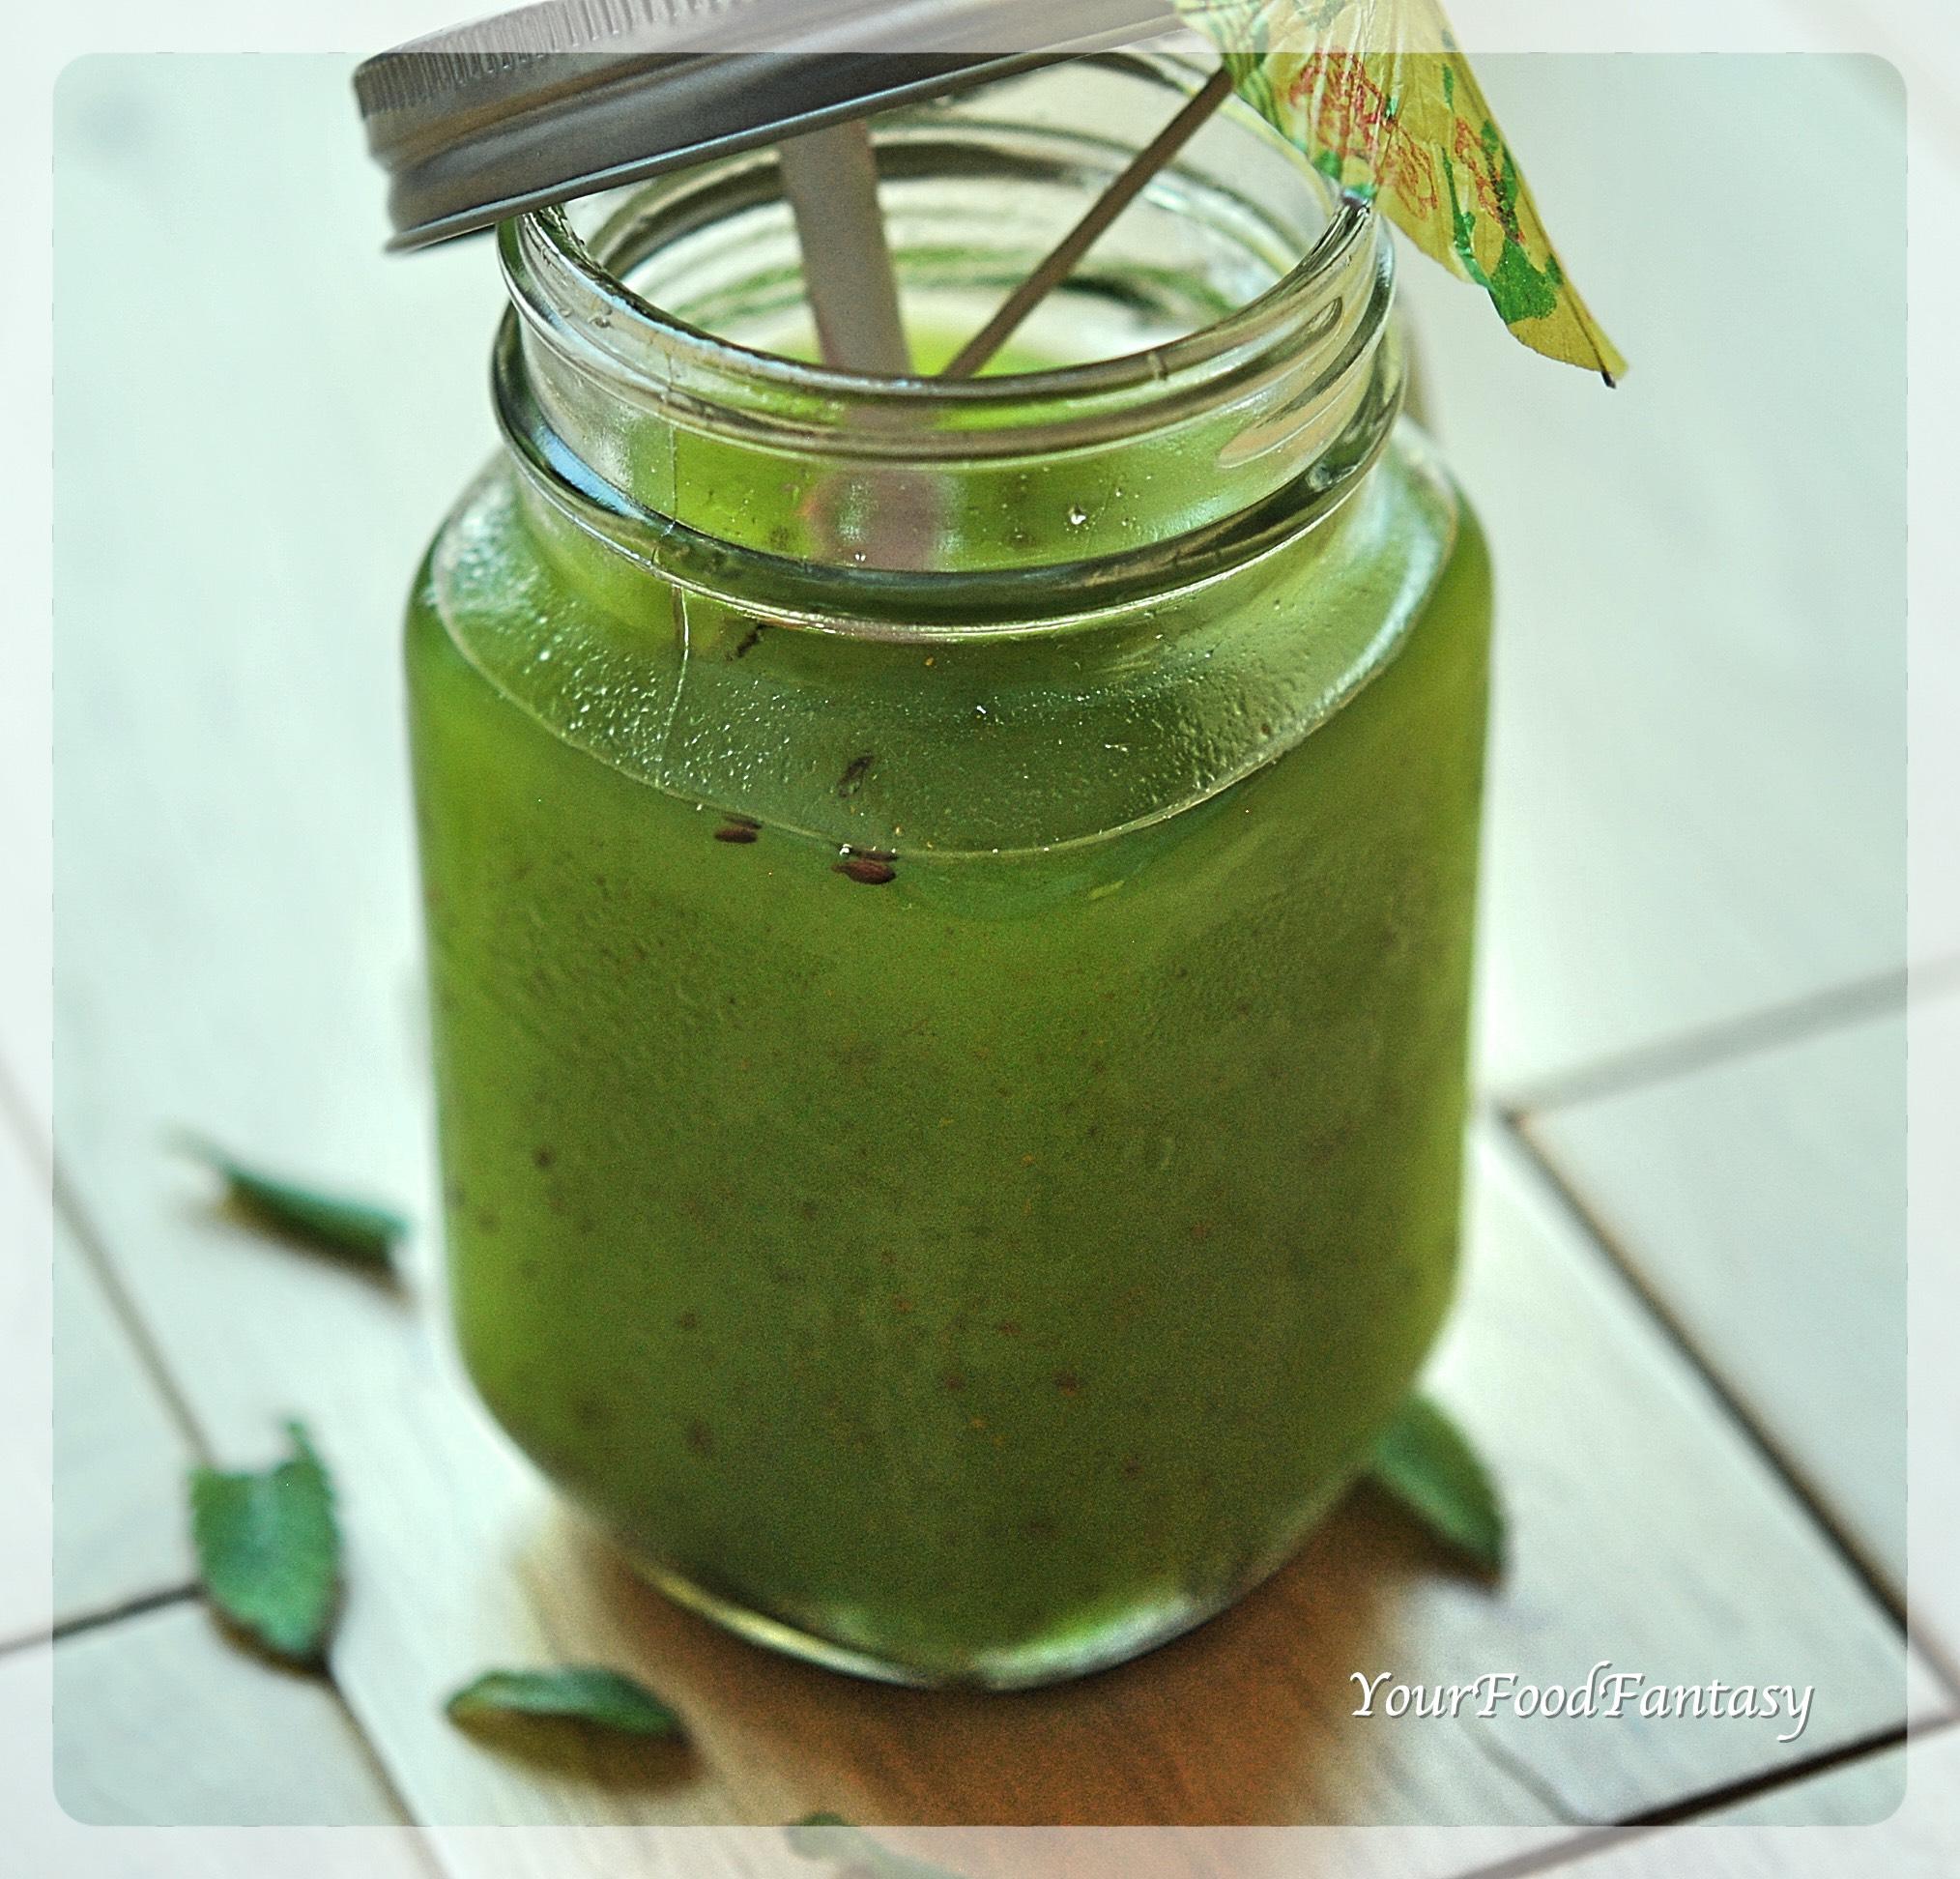 Raw Mango Drink - Aam Panna Recipe   YourFoodFantasy.com by Meenu Gupta